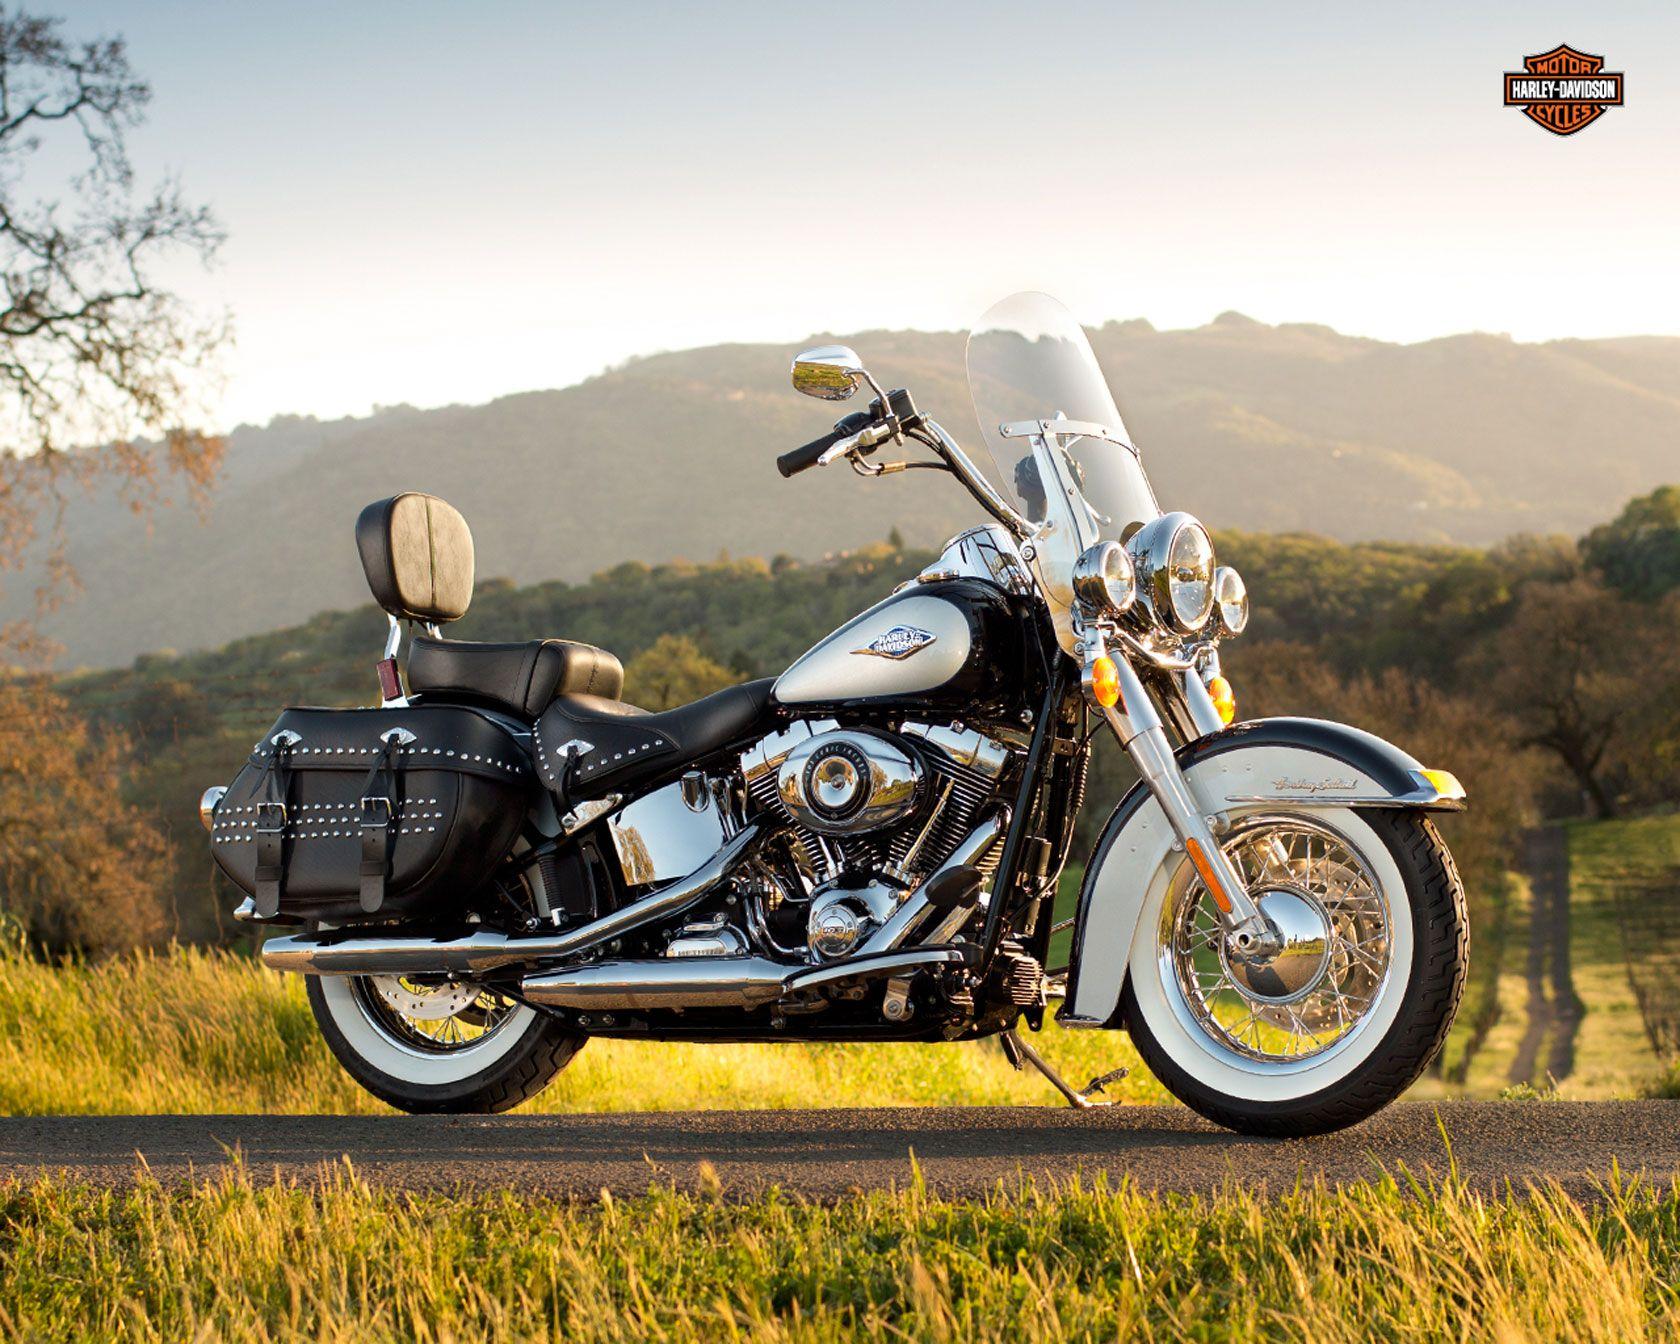 2013 harley davidson heritage softail classic gets anniversary custom options photo gallery